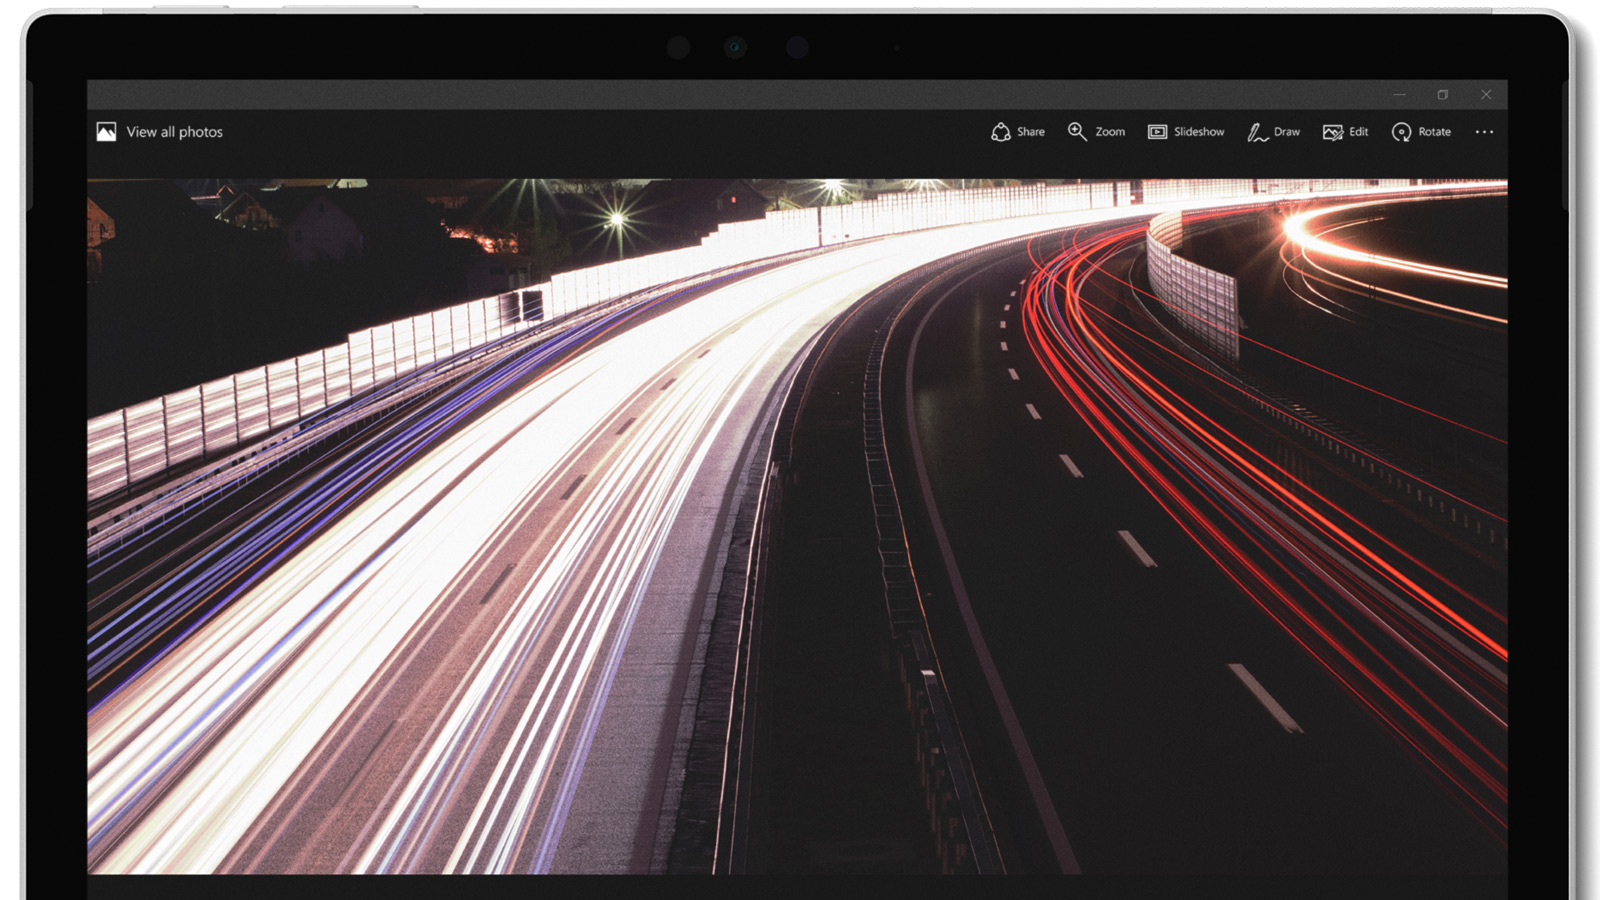 Surface Pro 的 12.3 英寸 PixelSense™ 显示屏具有鲜艳的色彩和锐利的分辨率